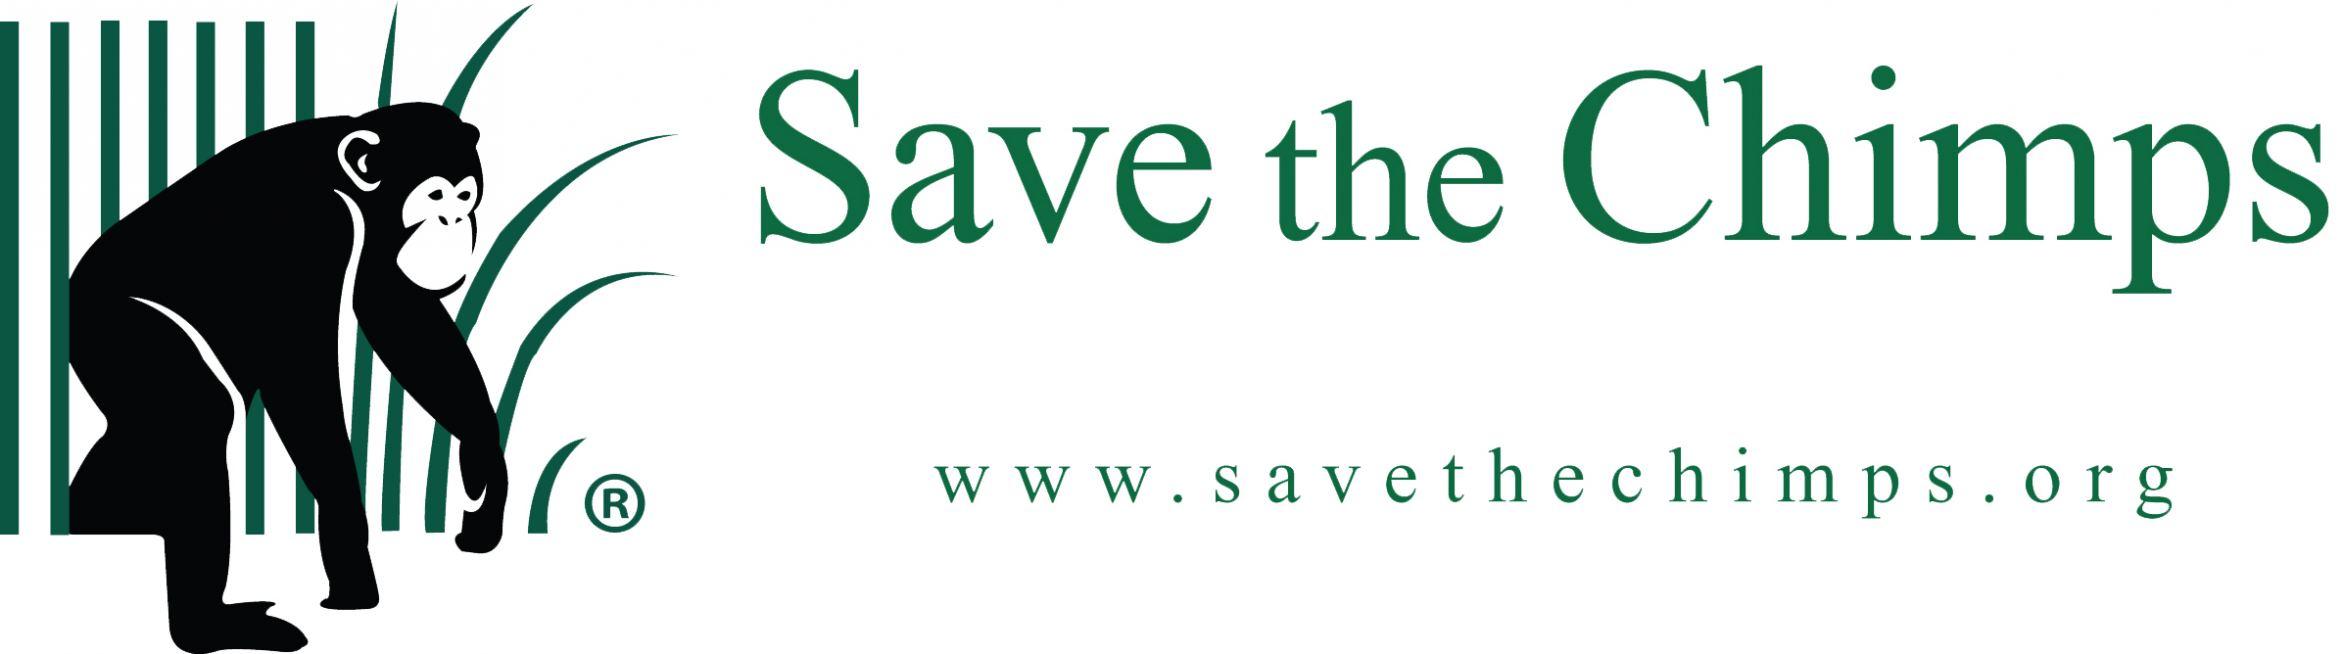 Save the Chimps, Inc. Logo